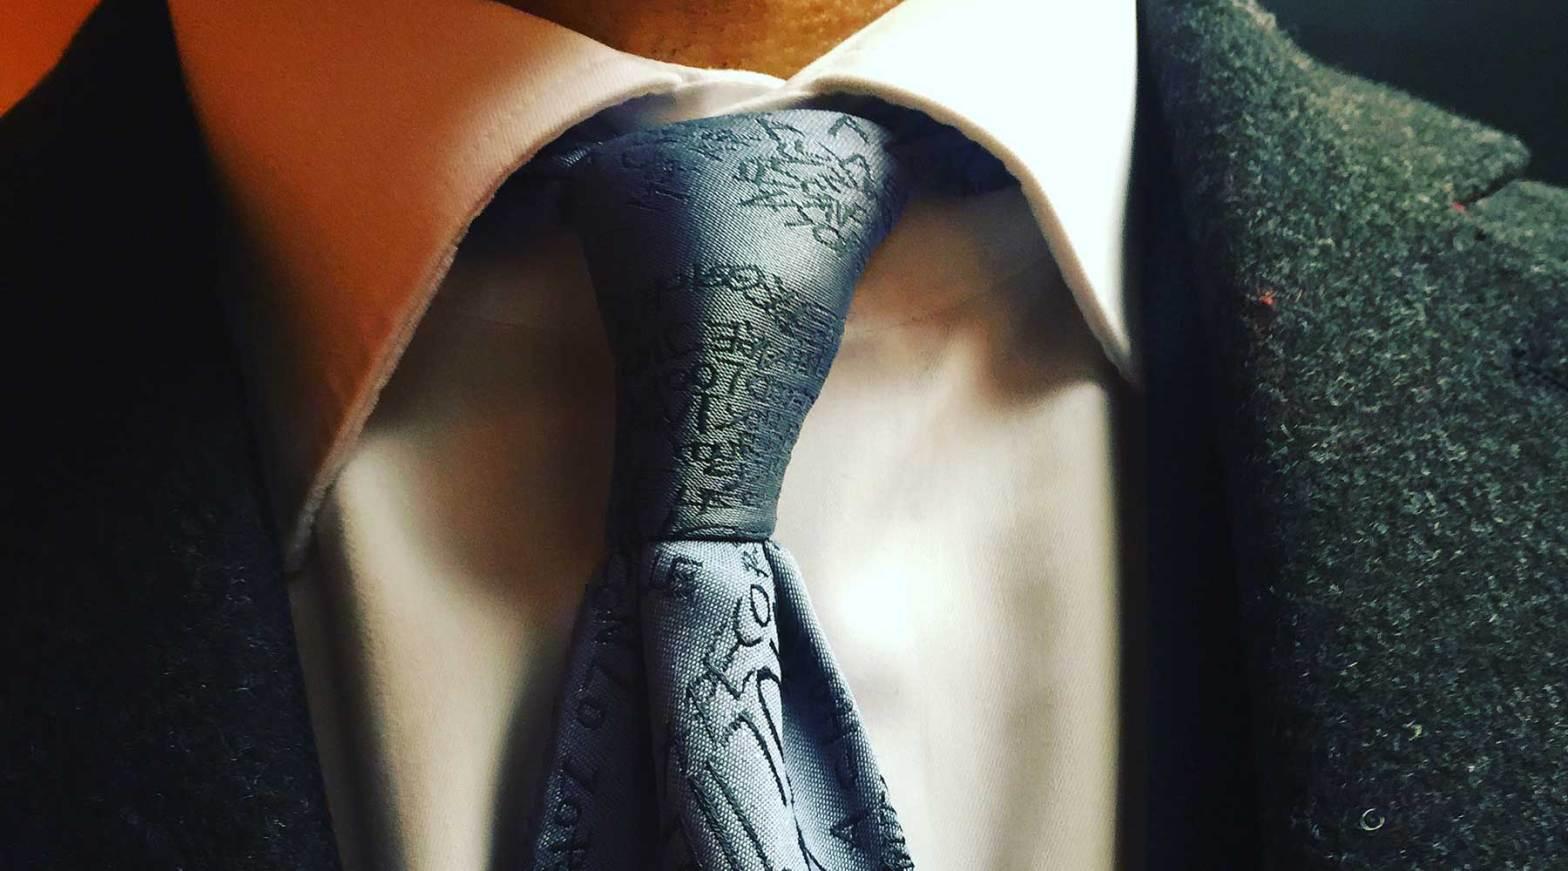 VivBon clothing care klädvård